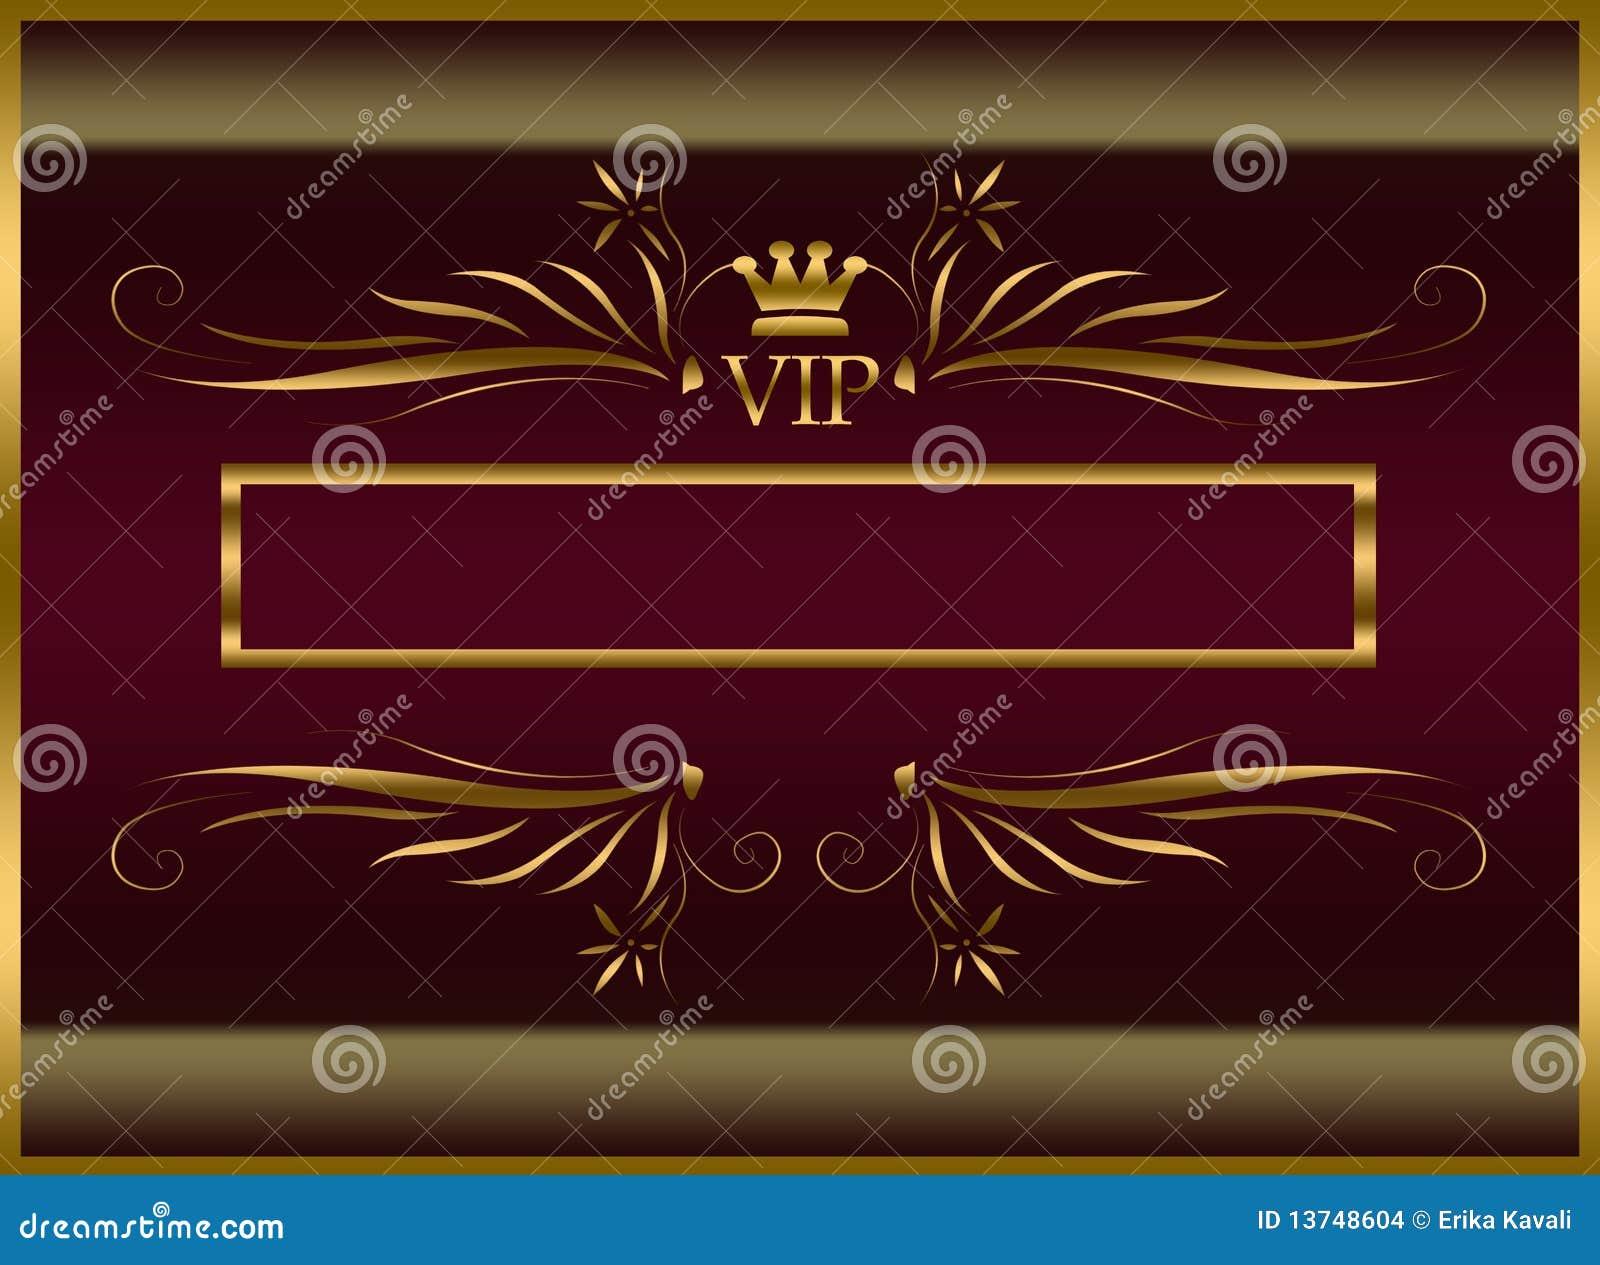 elegant vip template stock illustration illustration of colorful